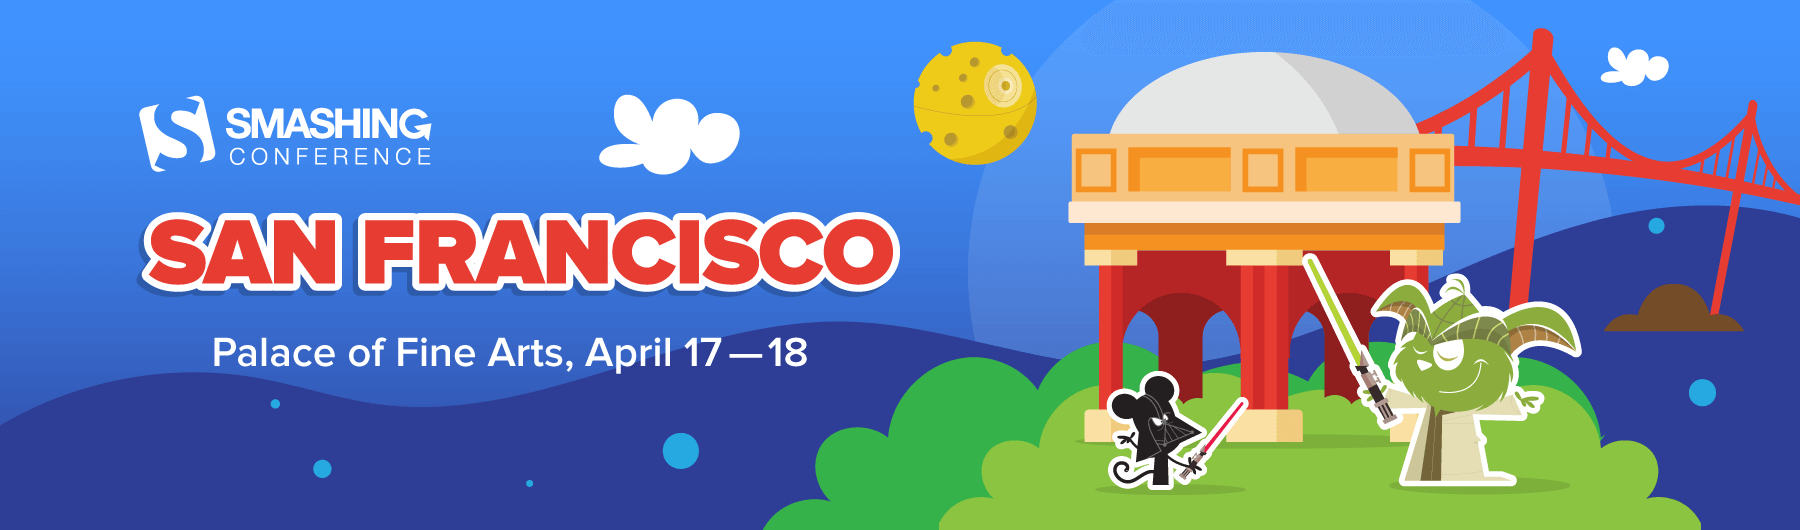 SmashingConf San Francisco (April 17-18)